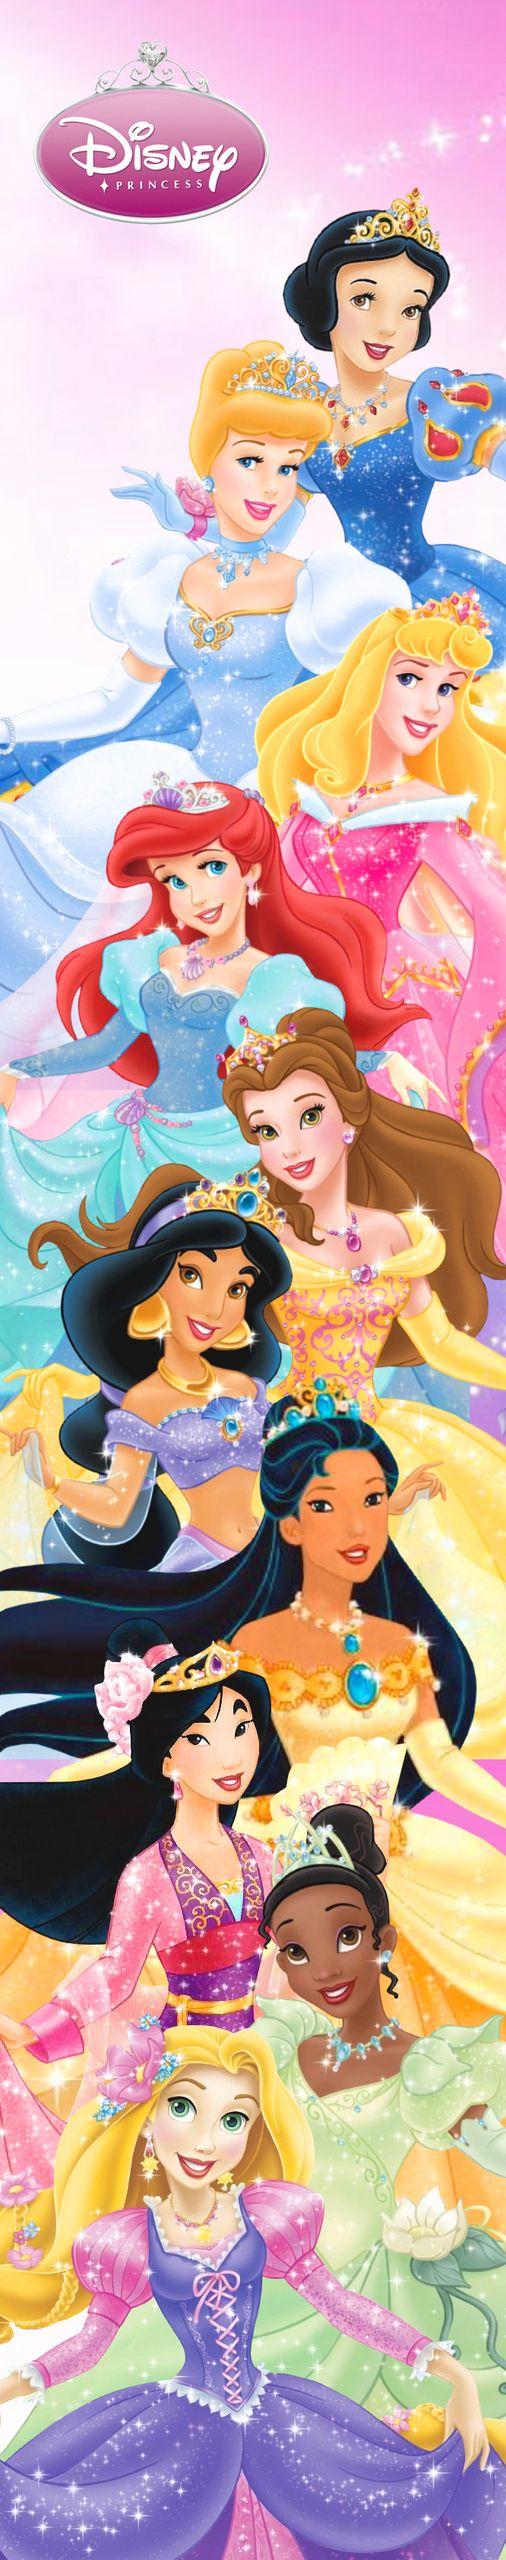 101 best disney images on Pinterest | Disney drawings, Wallpapers ...